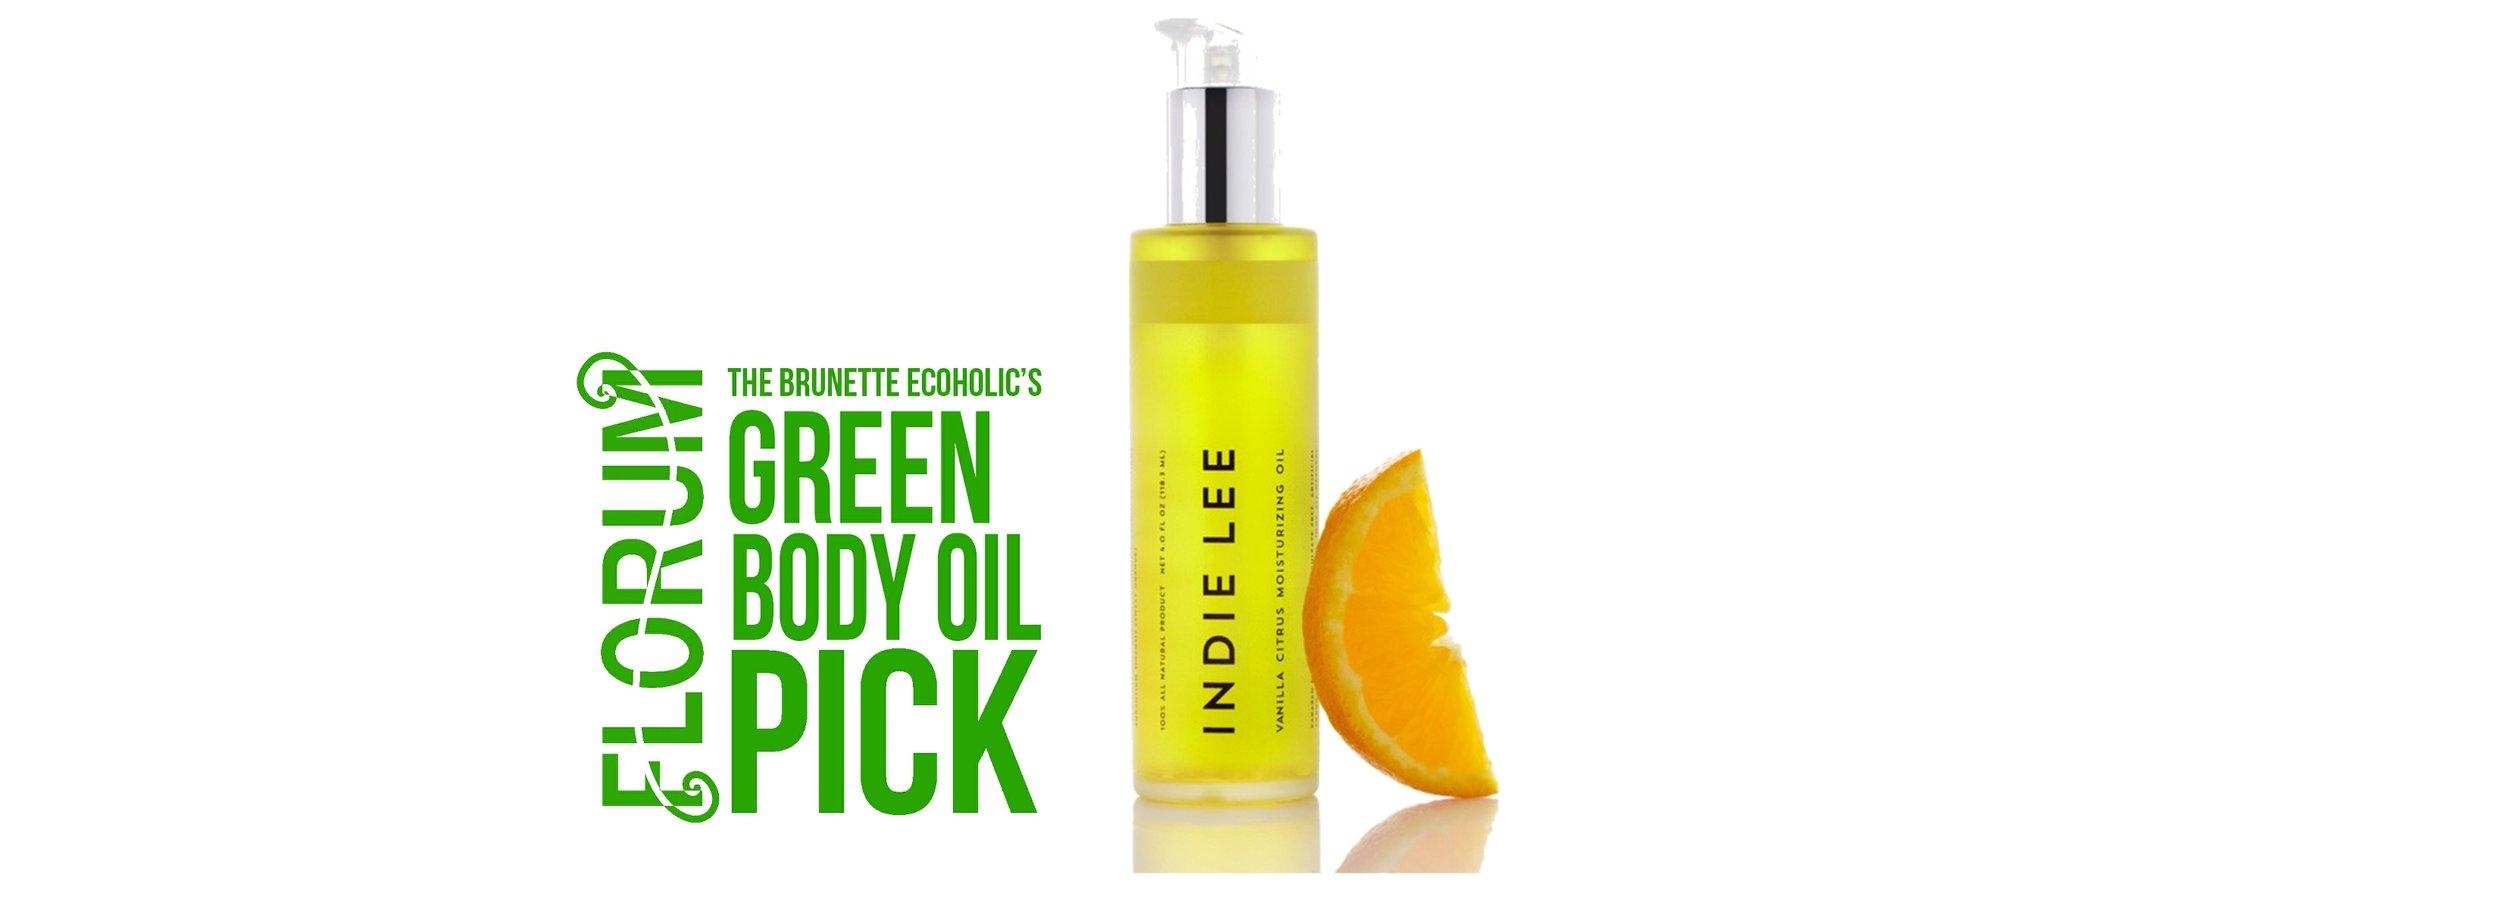 Florum Fashion Magazine - Green Product Swap - by Sabrina Zimmerman of the Brunette Ecoholic - Body Oil Pick - Indie Lee Citrus vanilla Moisture